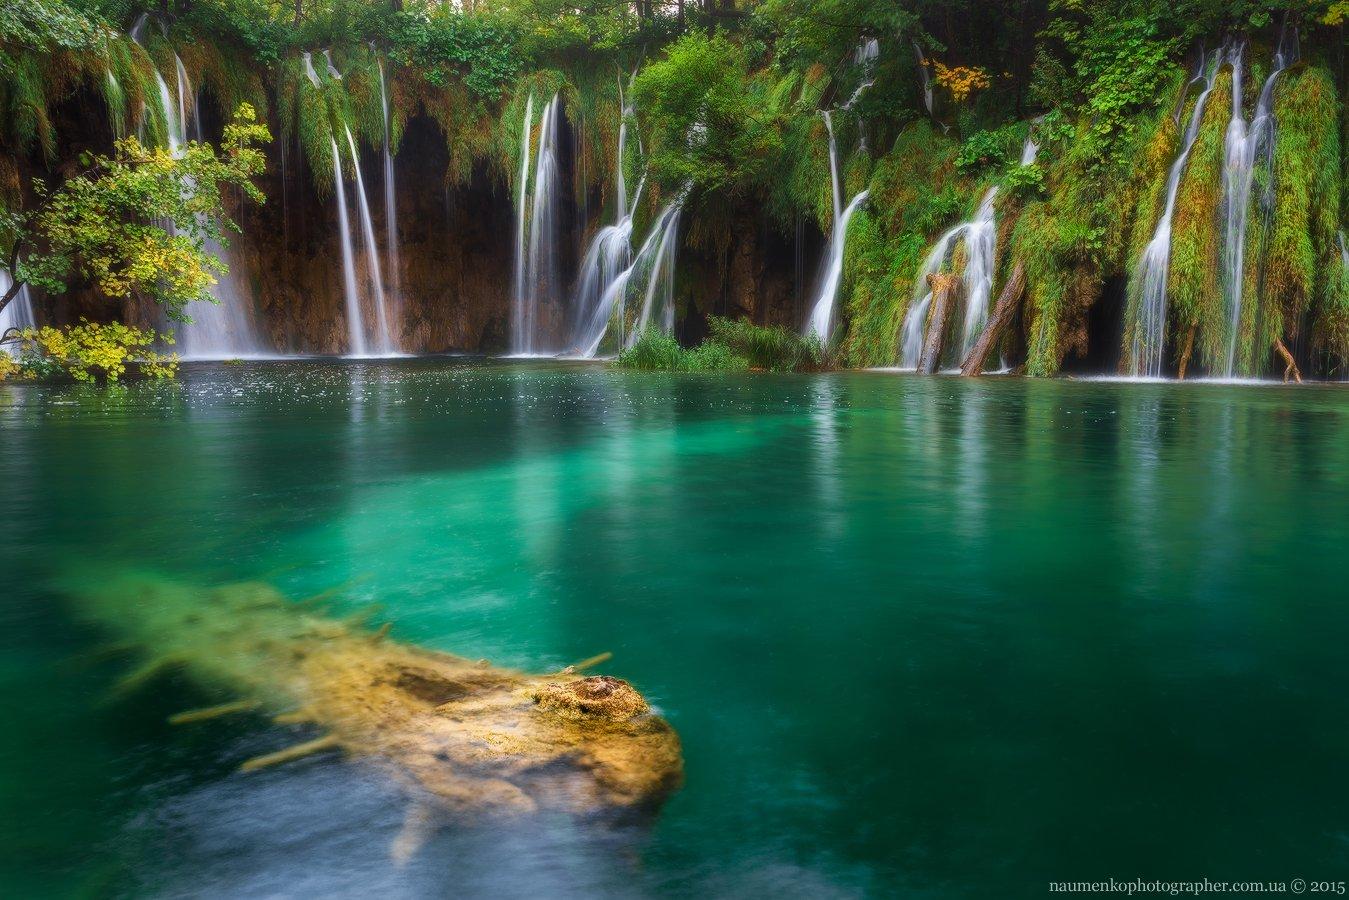 naumenkophotographer, sony a 7r, плитвицкие озера, хорватия, водопад, деревья, озеро, осень, панорама, пейзаж, размер, Александр Науменко